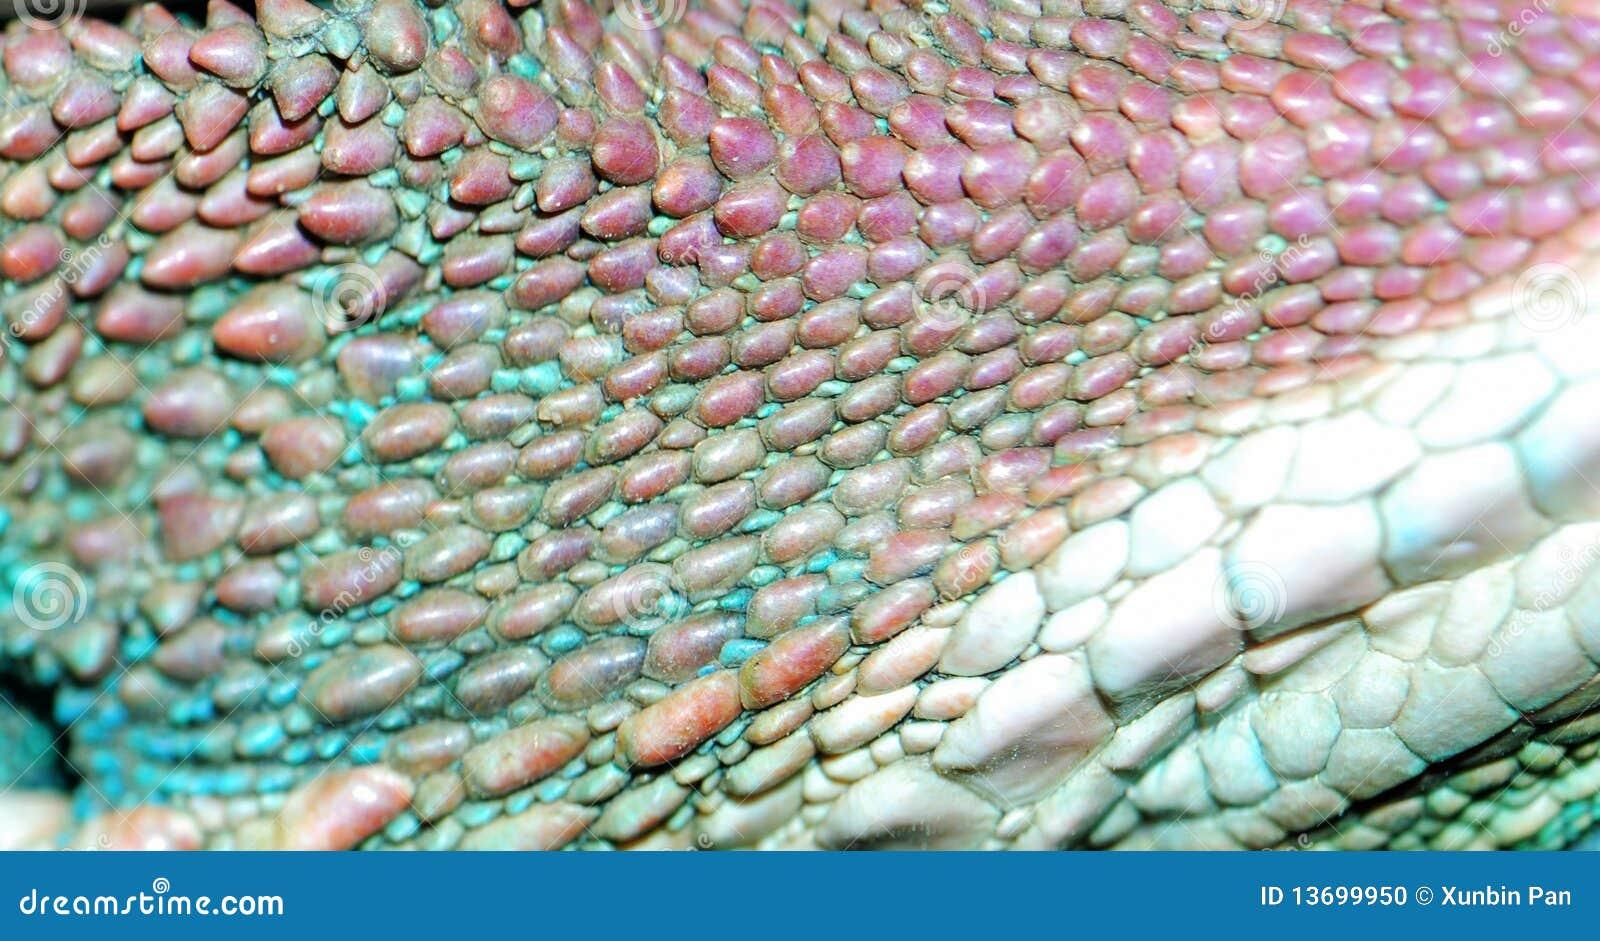 Animal Lizard Skin Texture Stock Photo Image 13699950